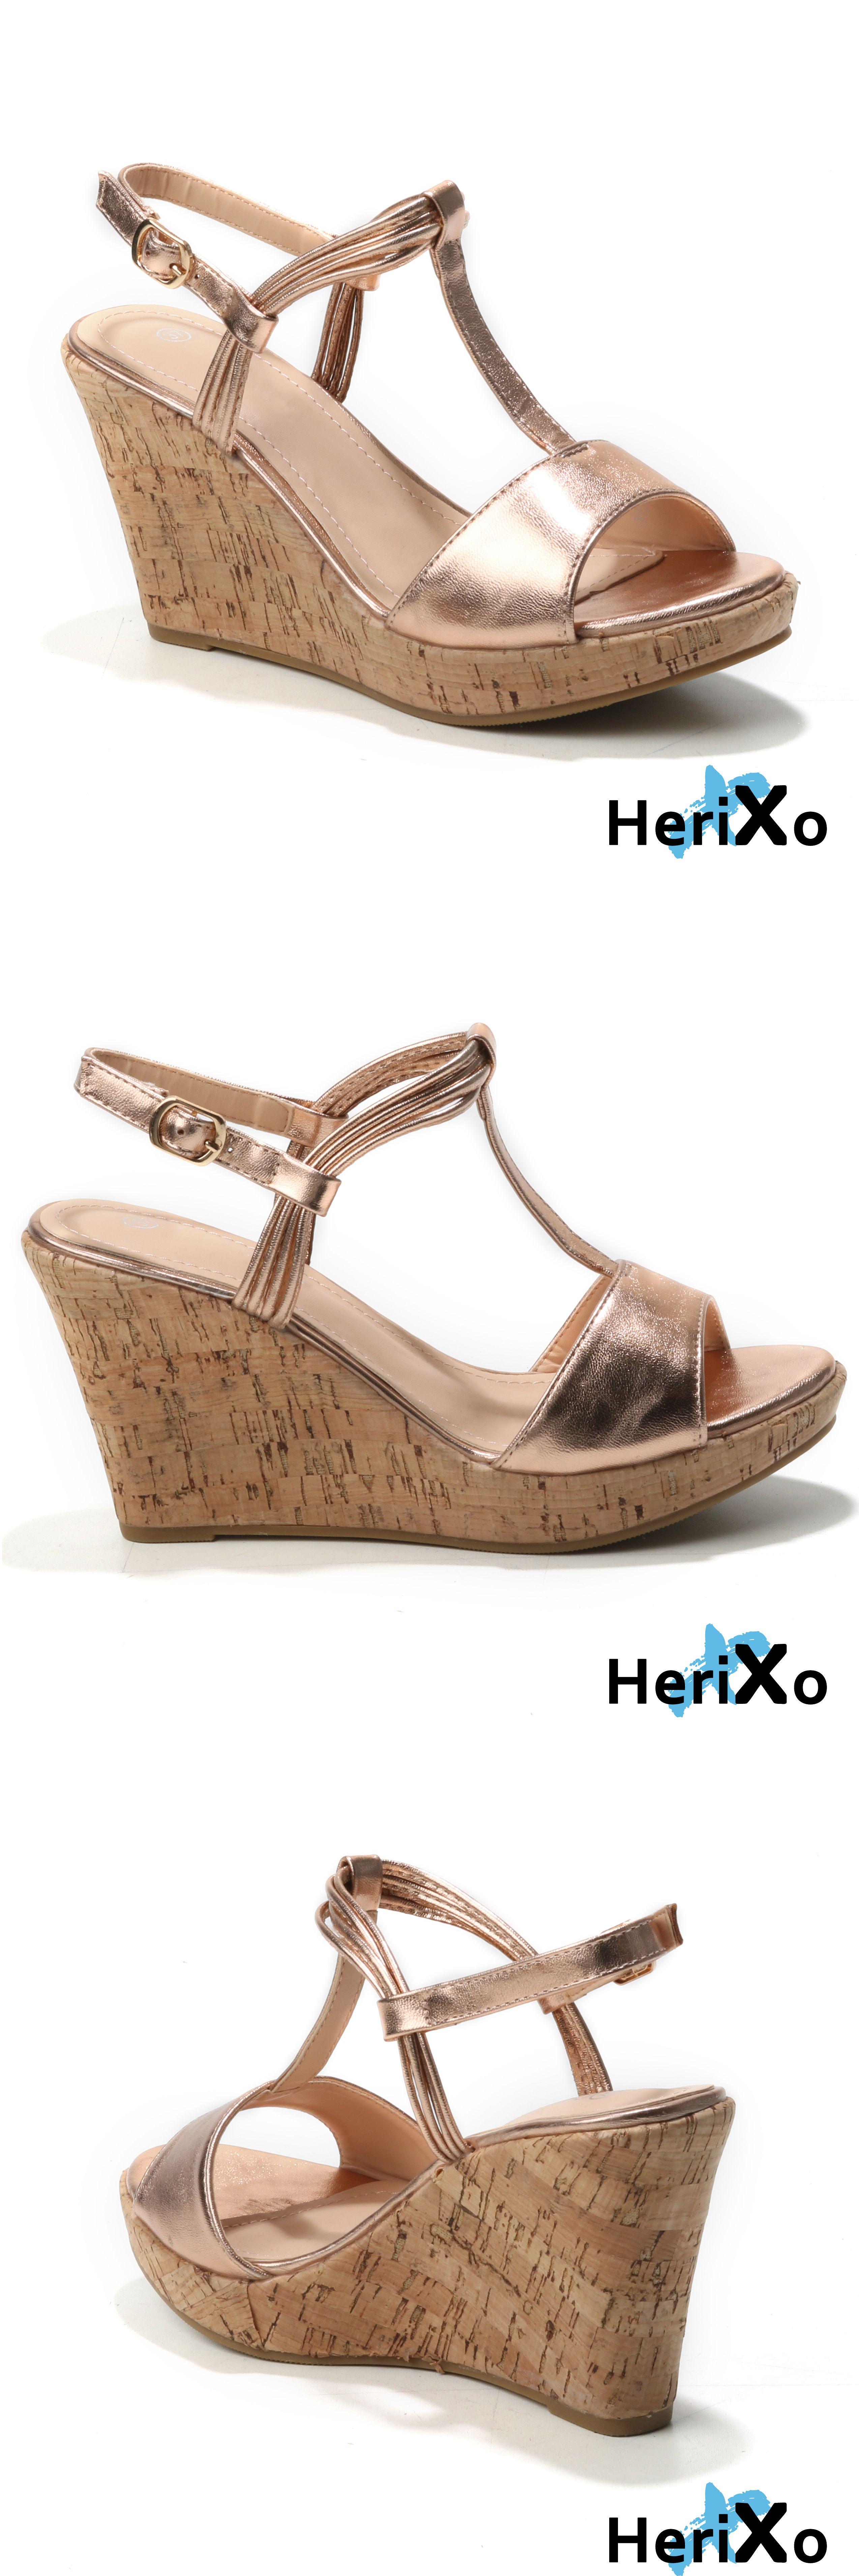 Sandara Damen Schuhe Offene Sandalen Kork Keilabsatz Wedge